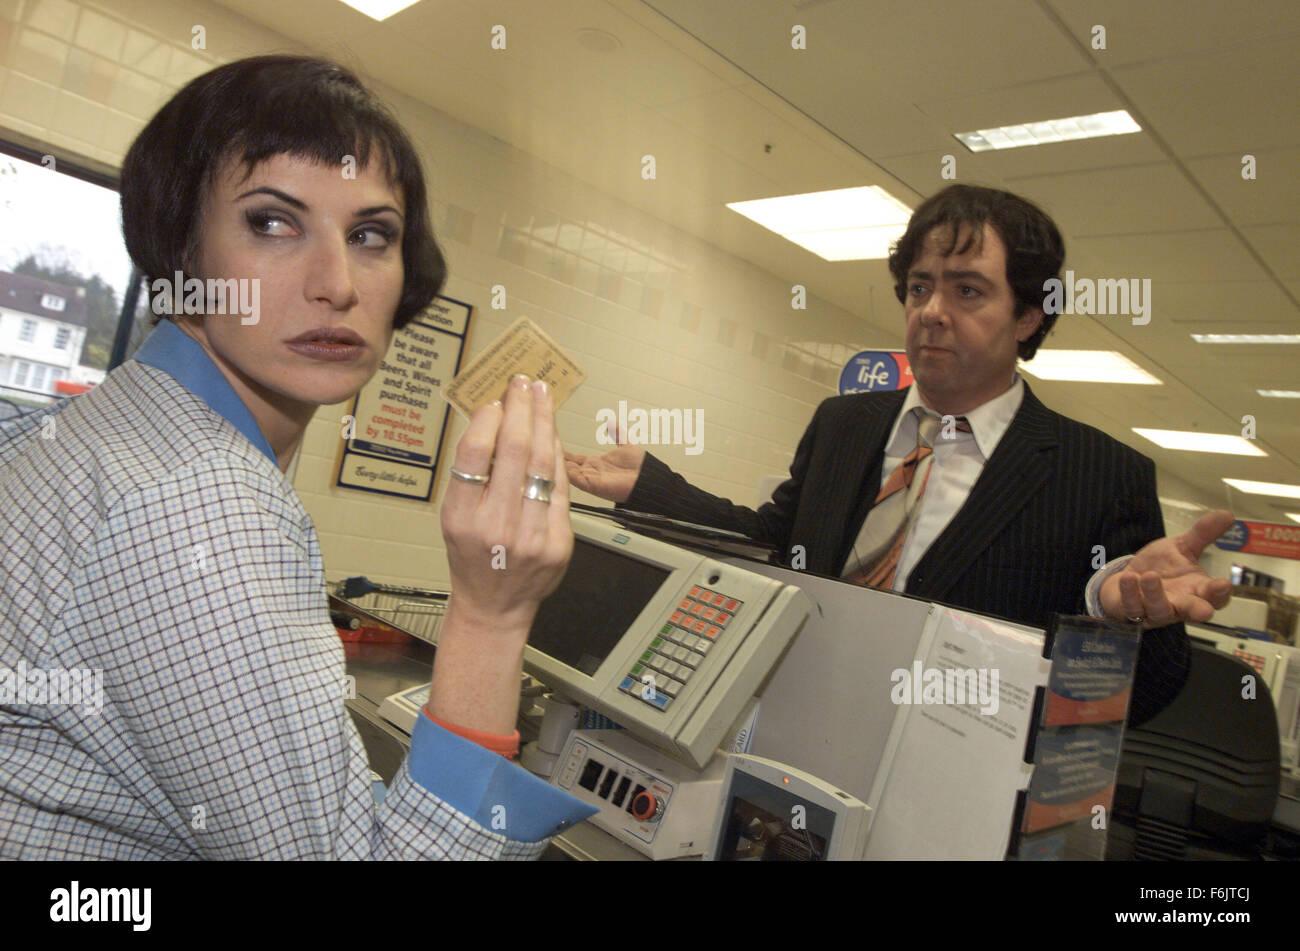 RELEASE DATE: October 22, 2004. MOVIE TITLE: Stella Street. STUDIO: Columbia TriStar. PLOT: A satirical glimpse Stock Photo